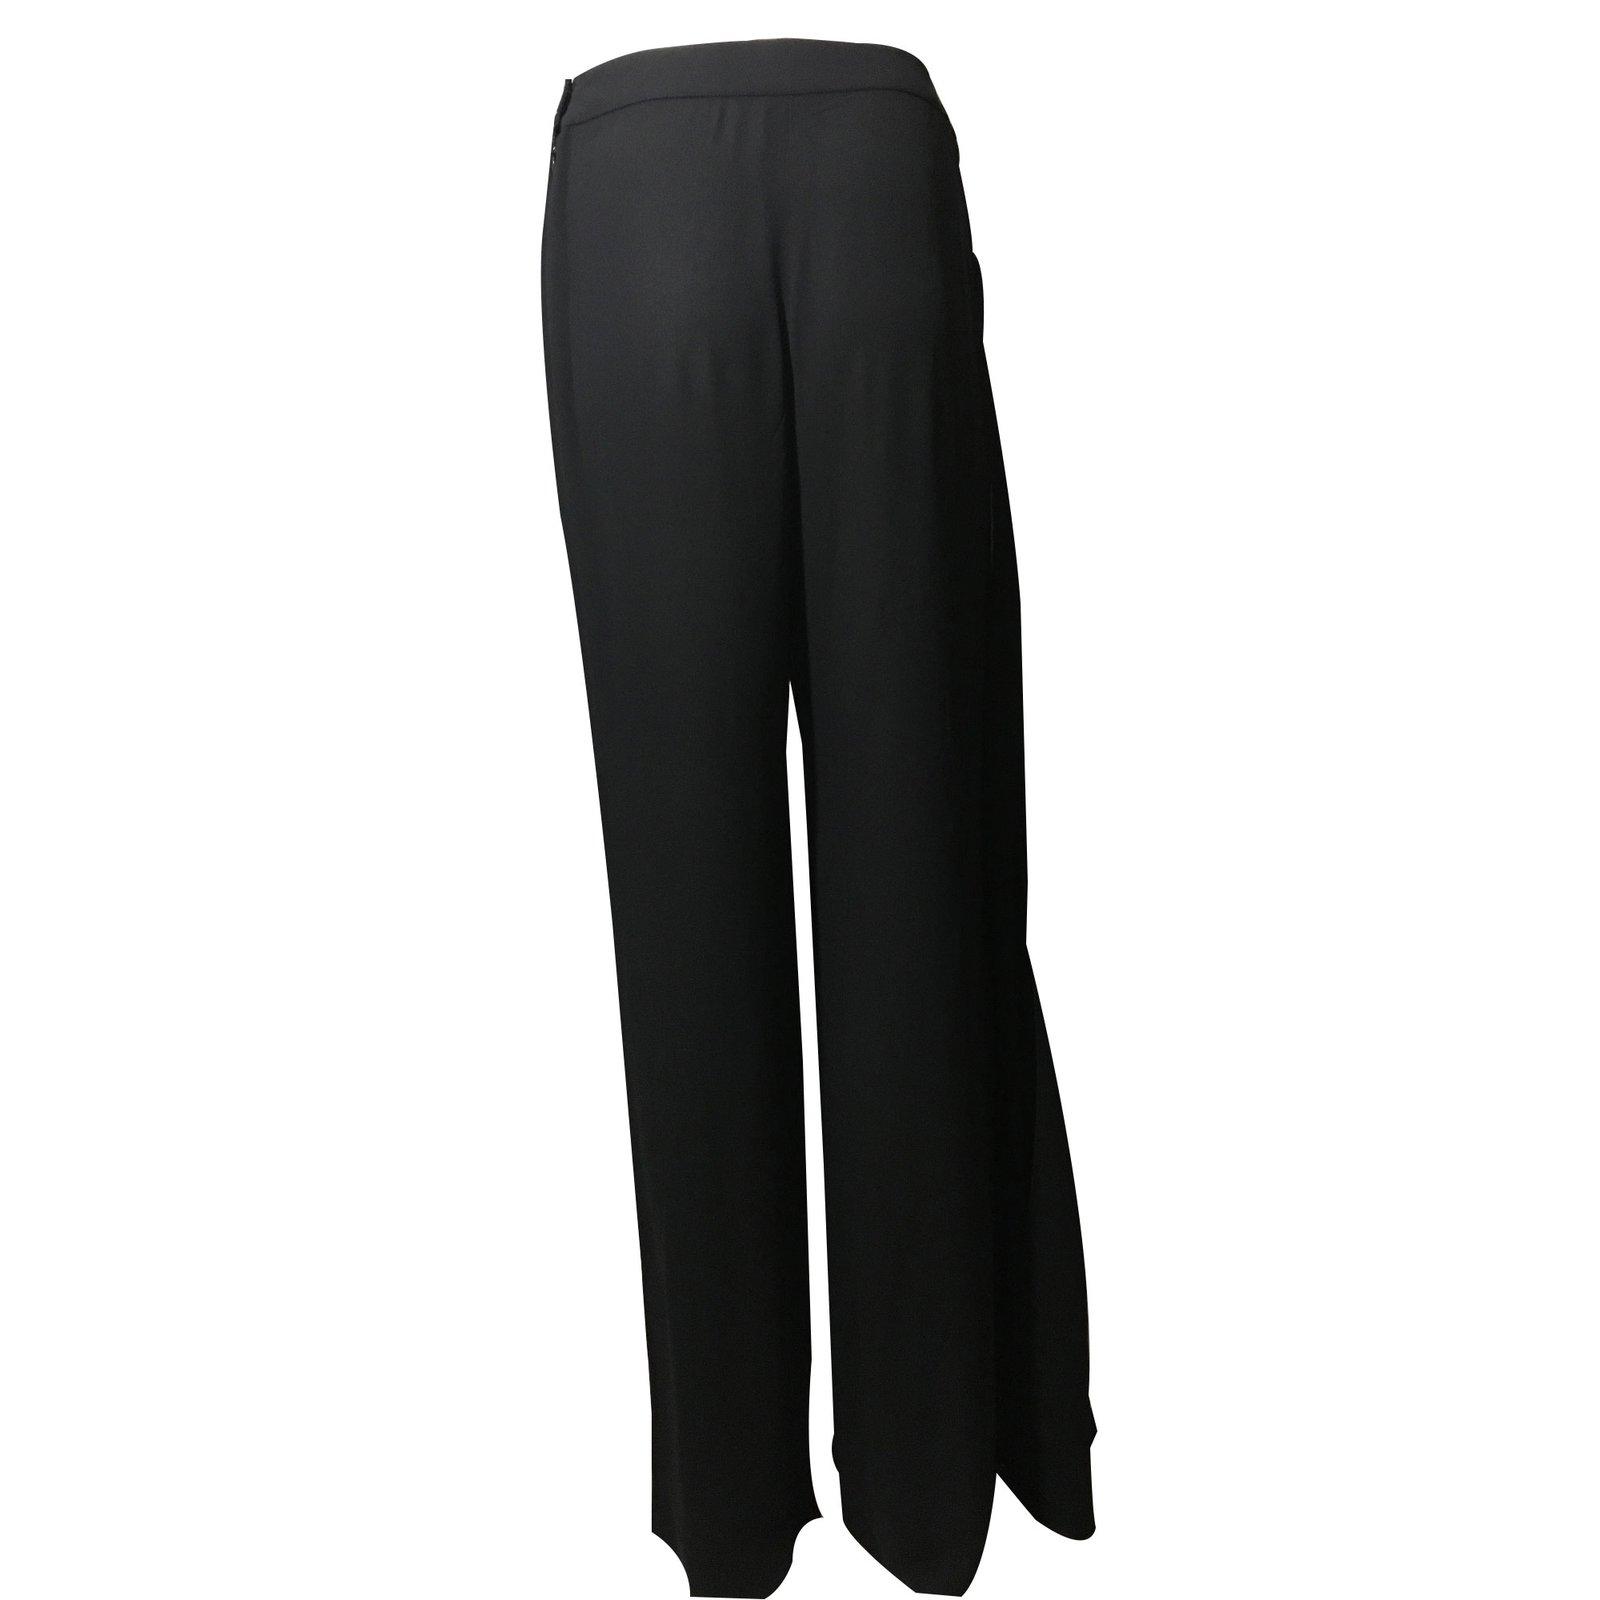 chanel yoga pants. chanel silk trousers pants, leggings black ref.25837 - joli closet yoga pants